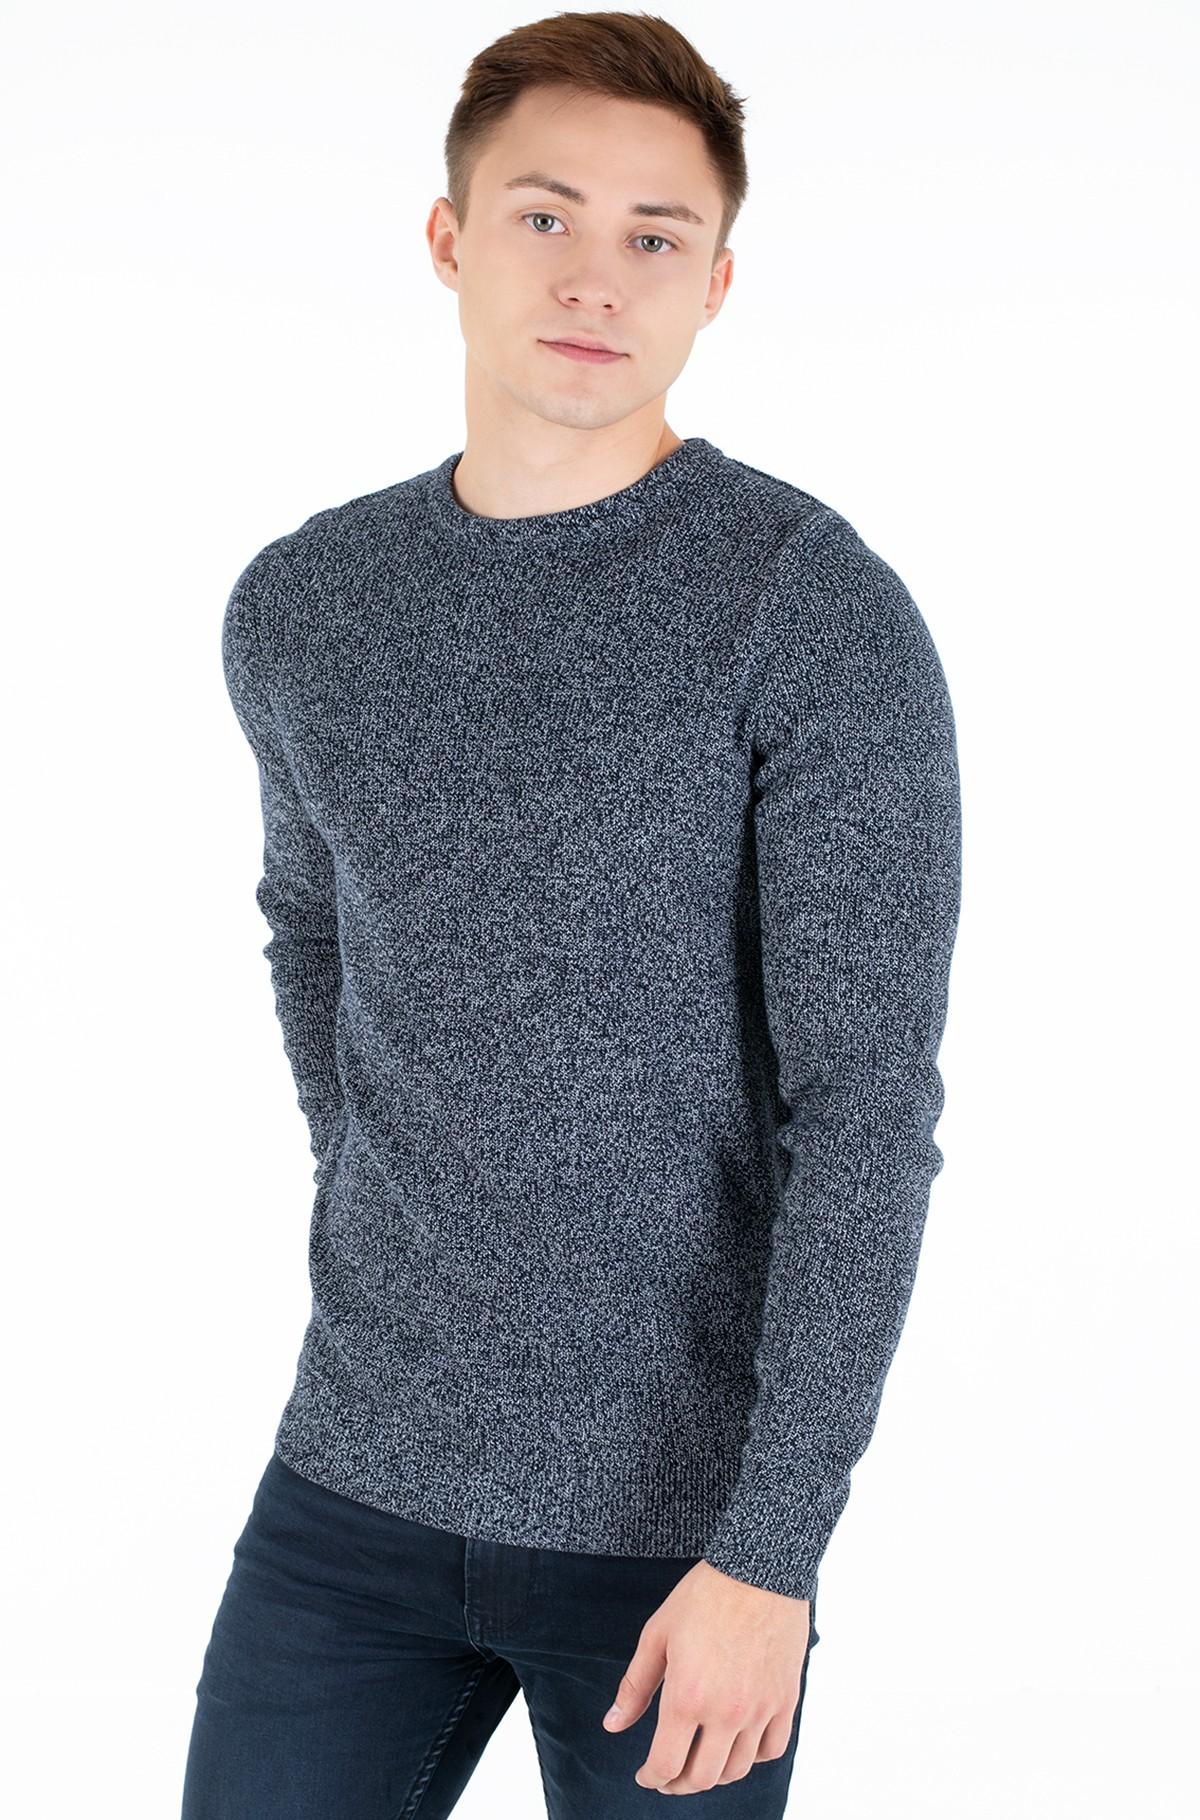 Sweater 1020316-full-1